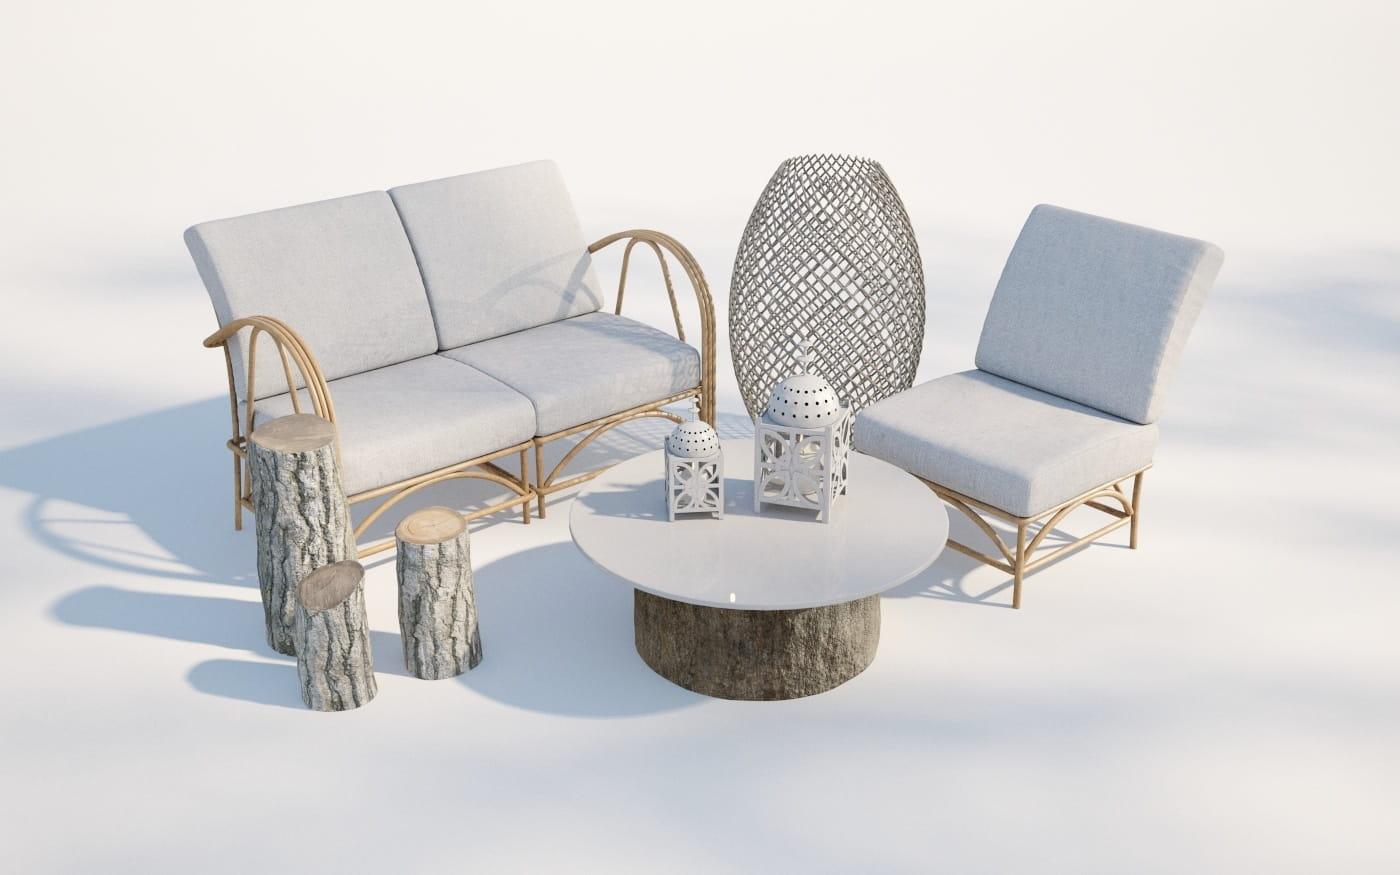 Furniture set 9 AM220 Archmodels